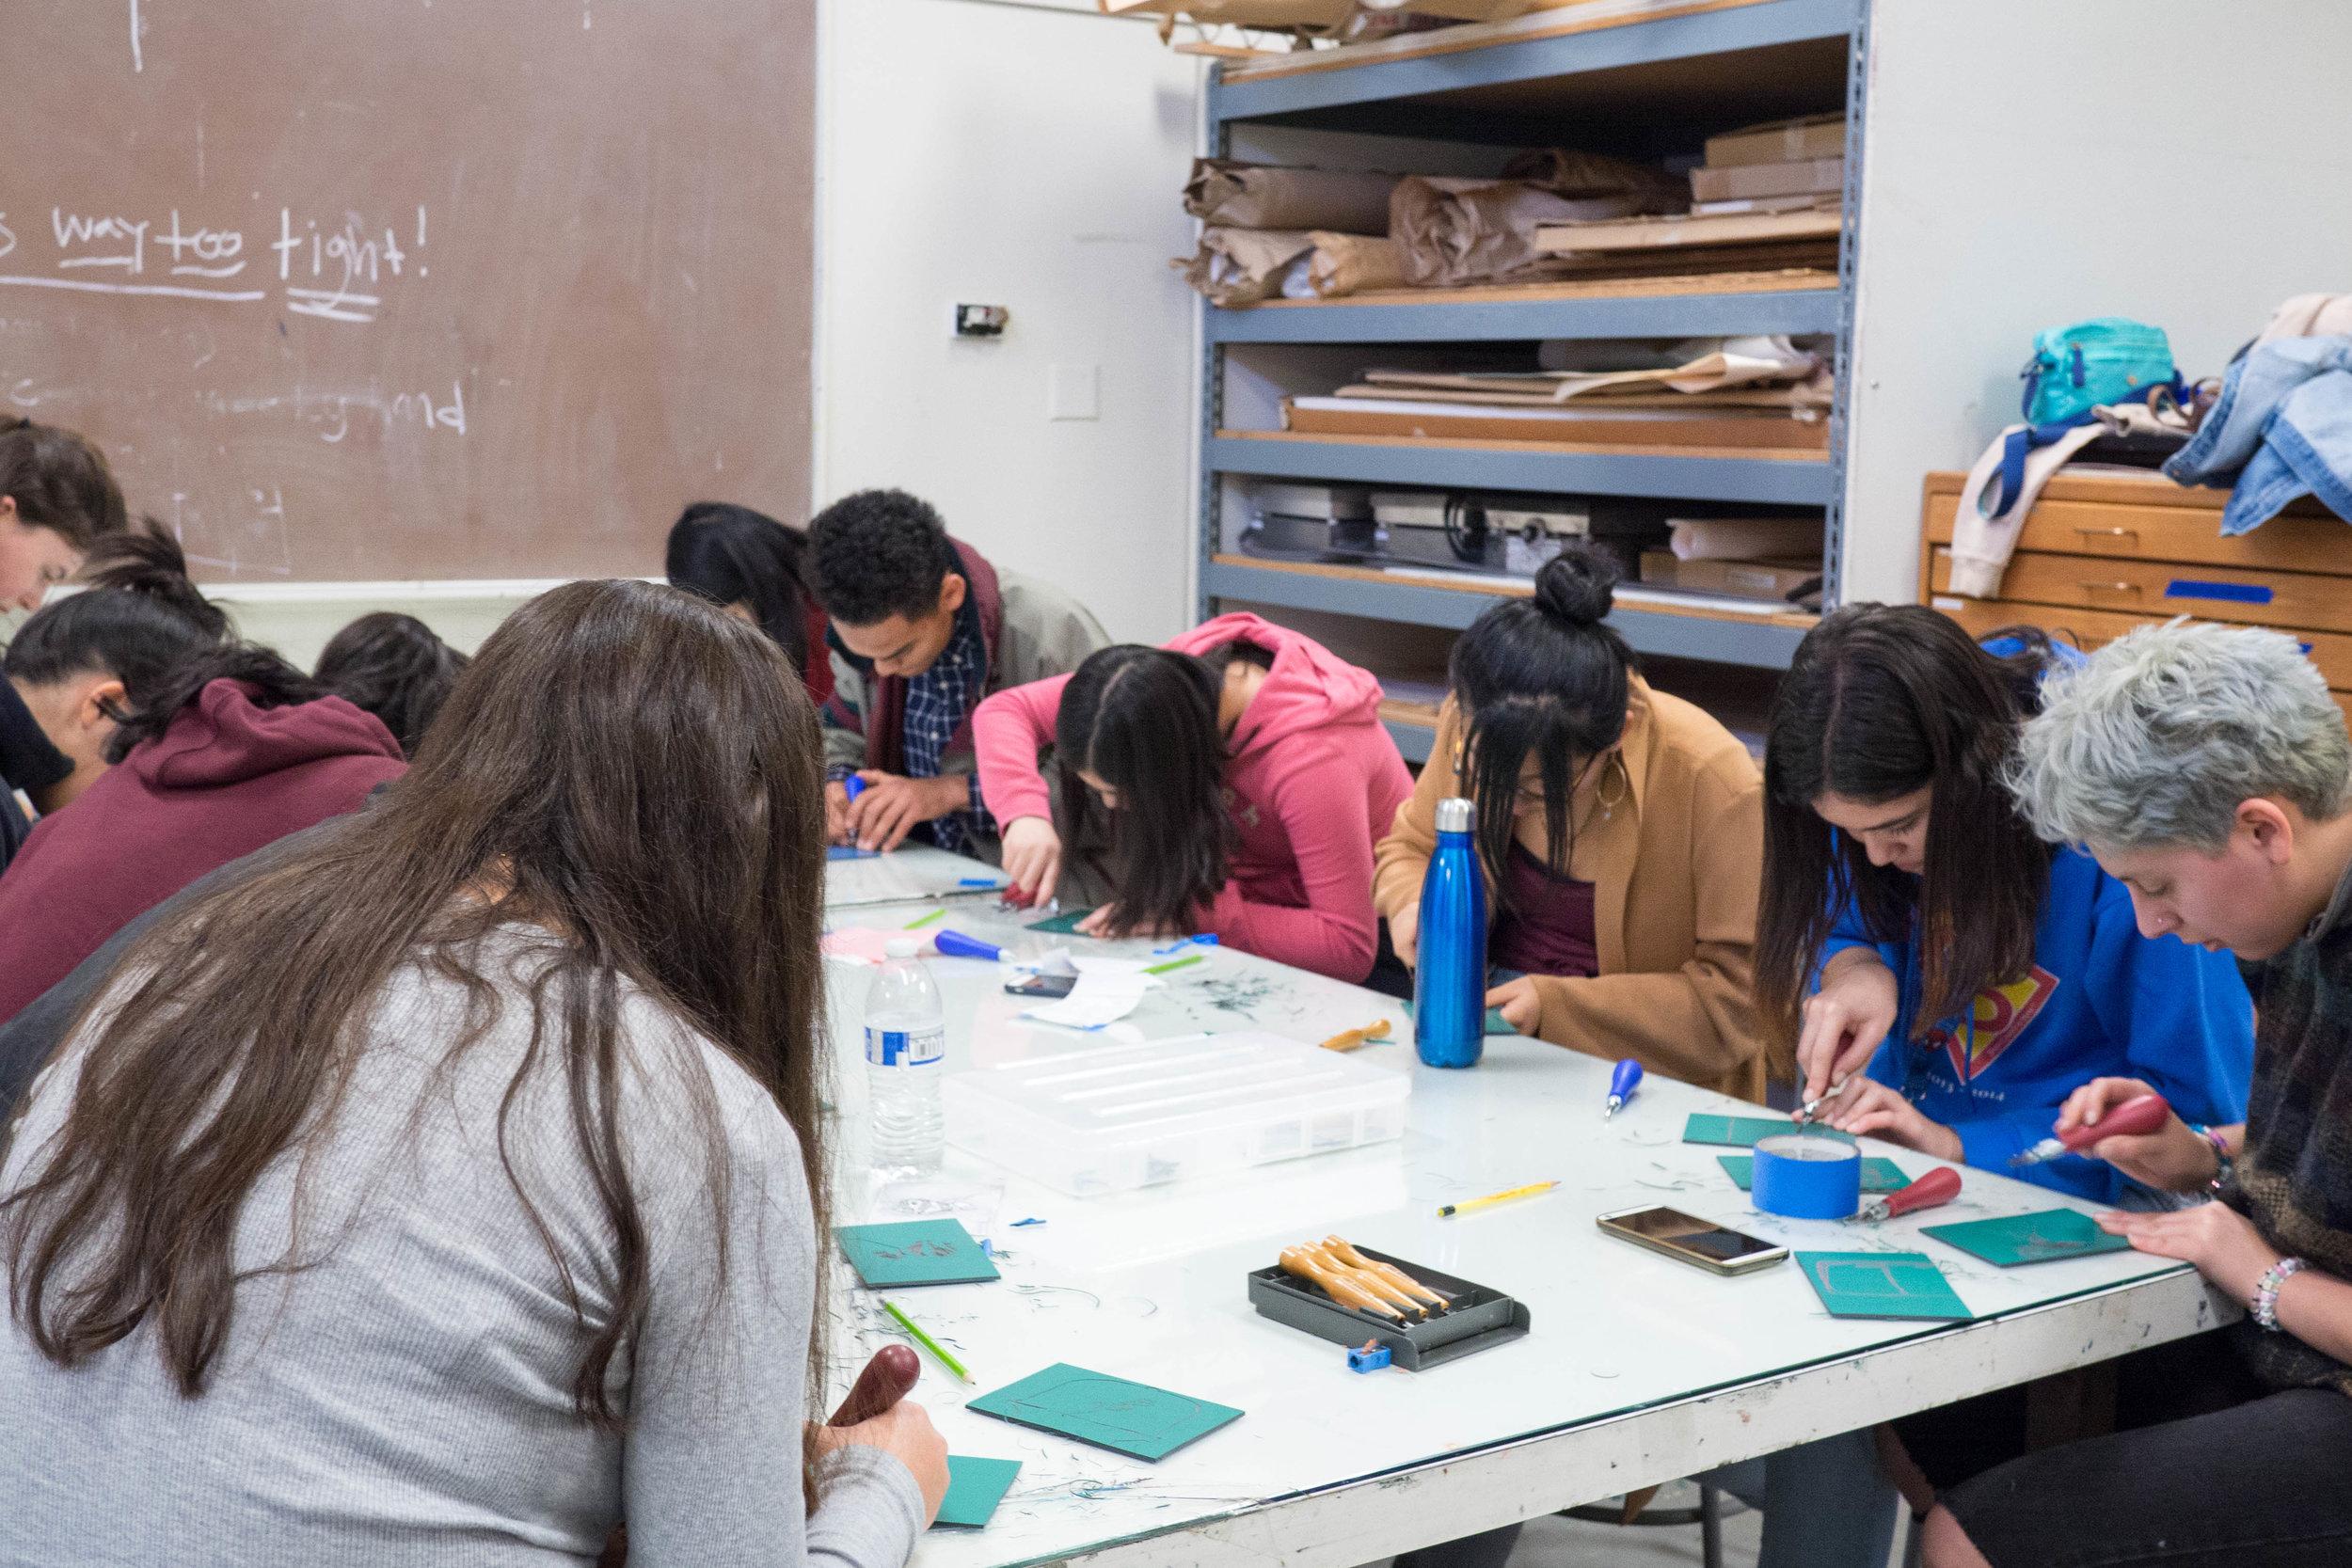 Participants carve their blocks as a group